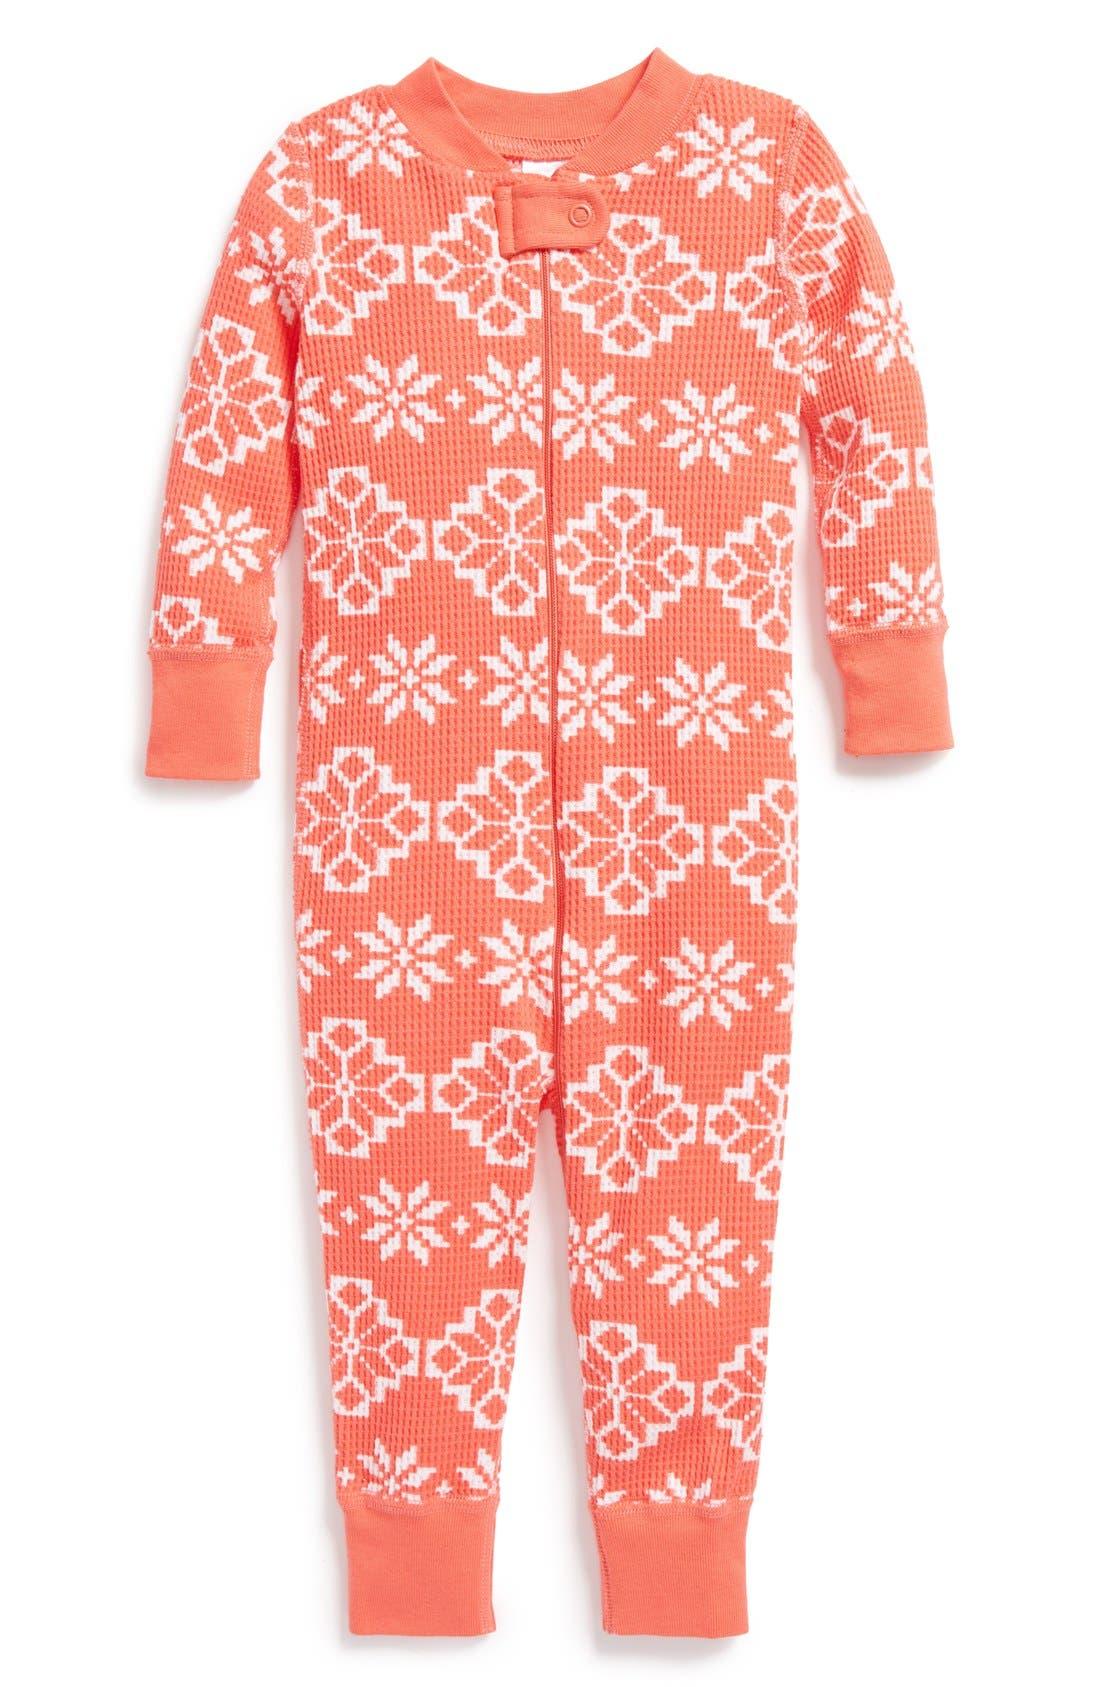 Alternate Image 1 Selected - Hanna Andersson Organic Cotton Romper Pajamas (Baby Girls)